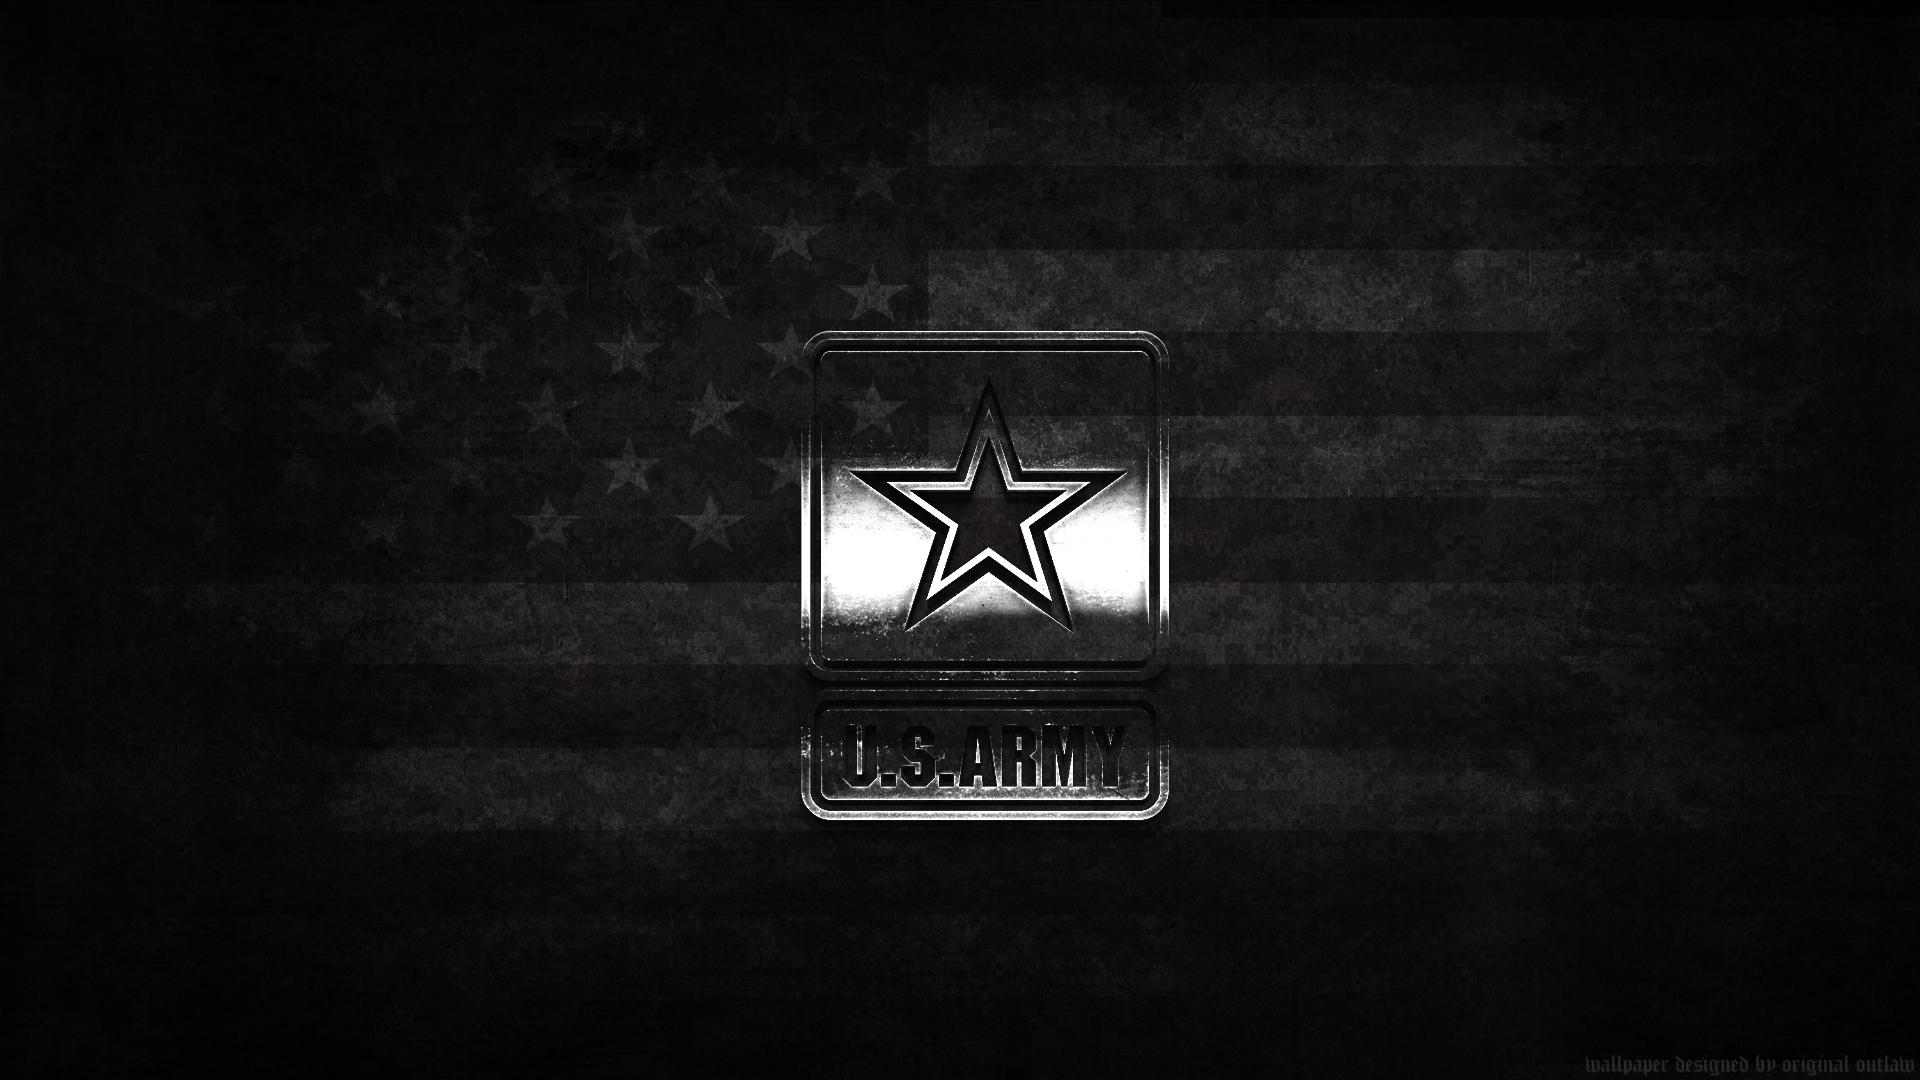 Popular Screensavers And Wallpaper 47 Images: [49+] US Army Screensavers And Wallpaper On WallpaperSafari